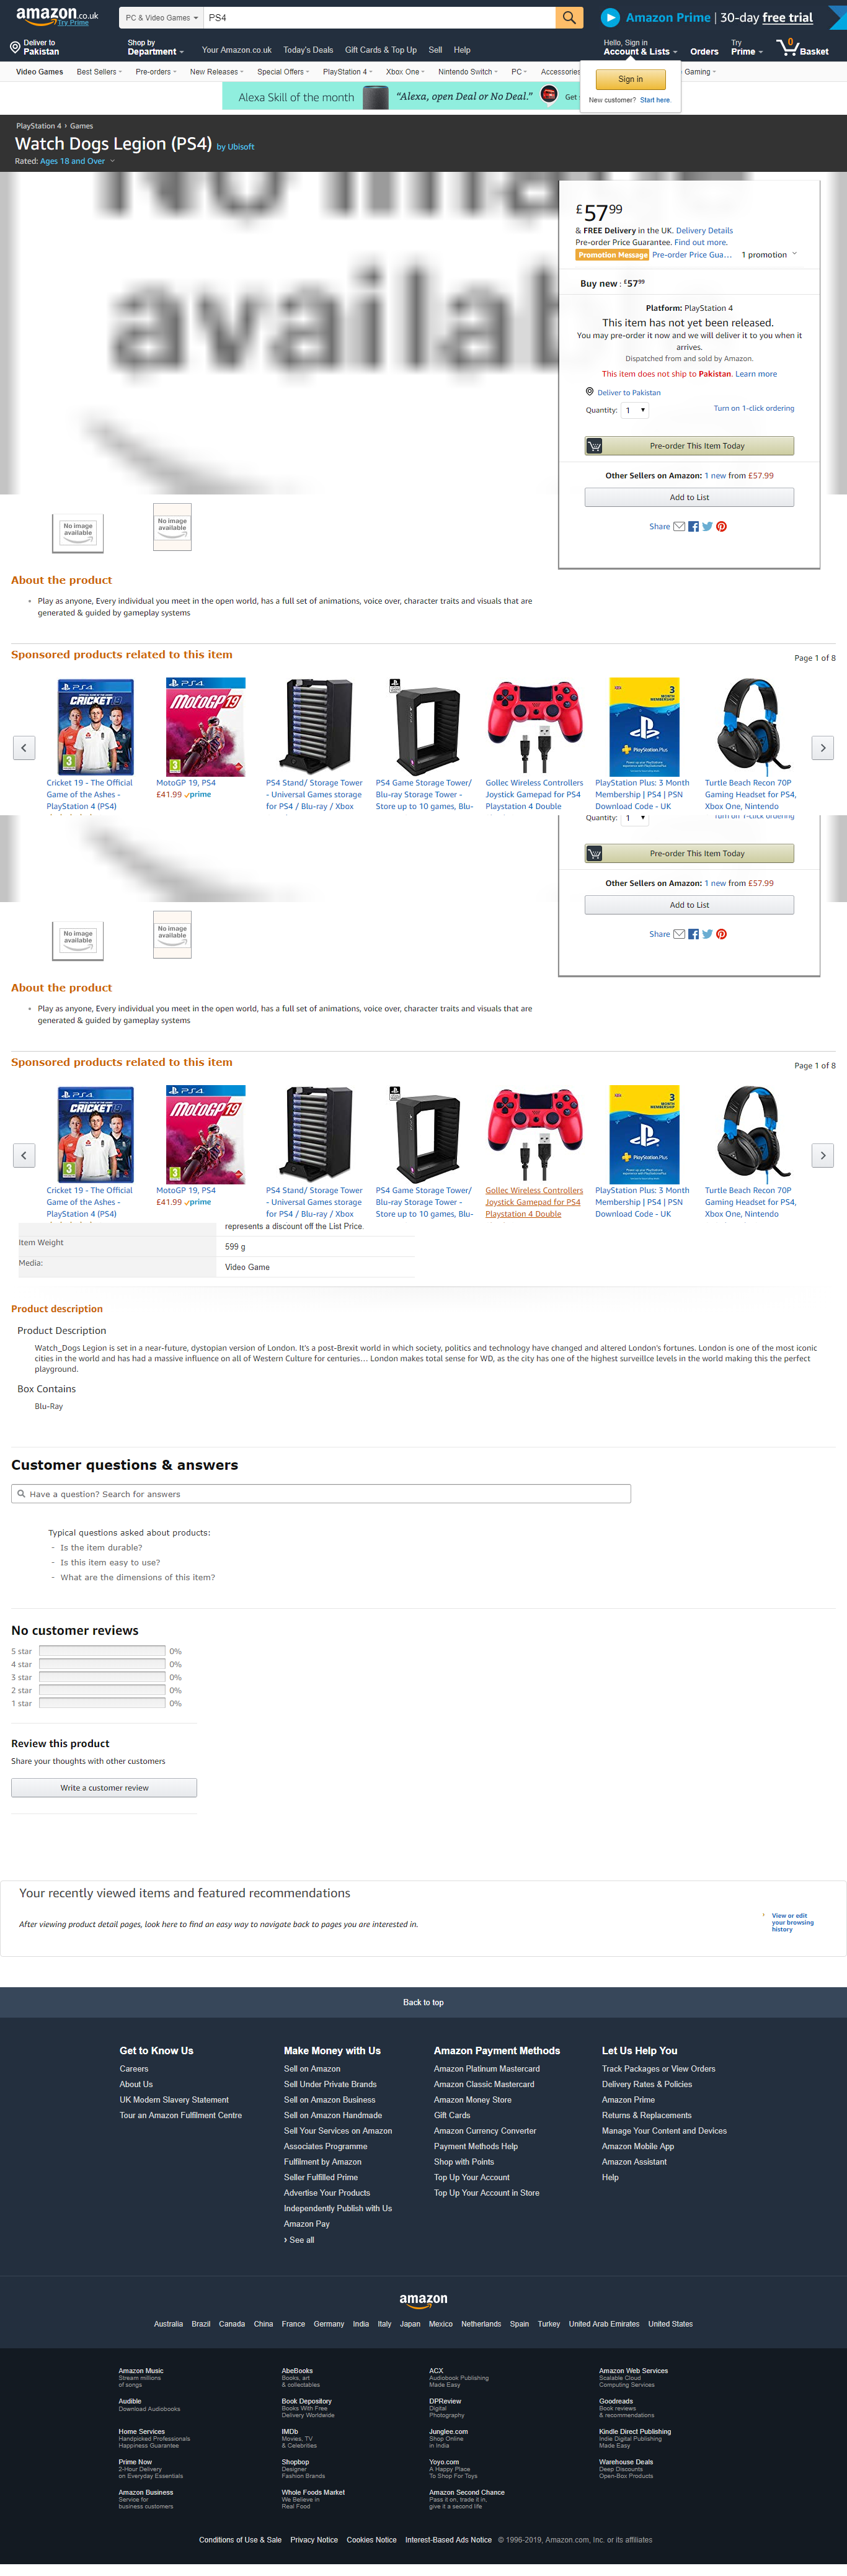 Watch Dogs 3 Amazon UK Leak